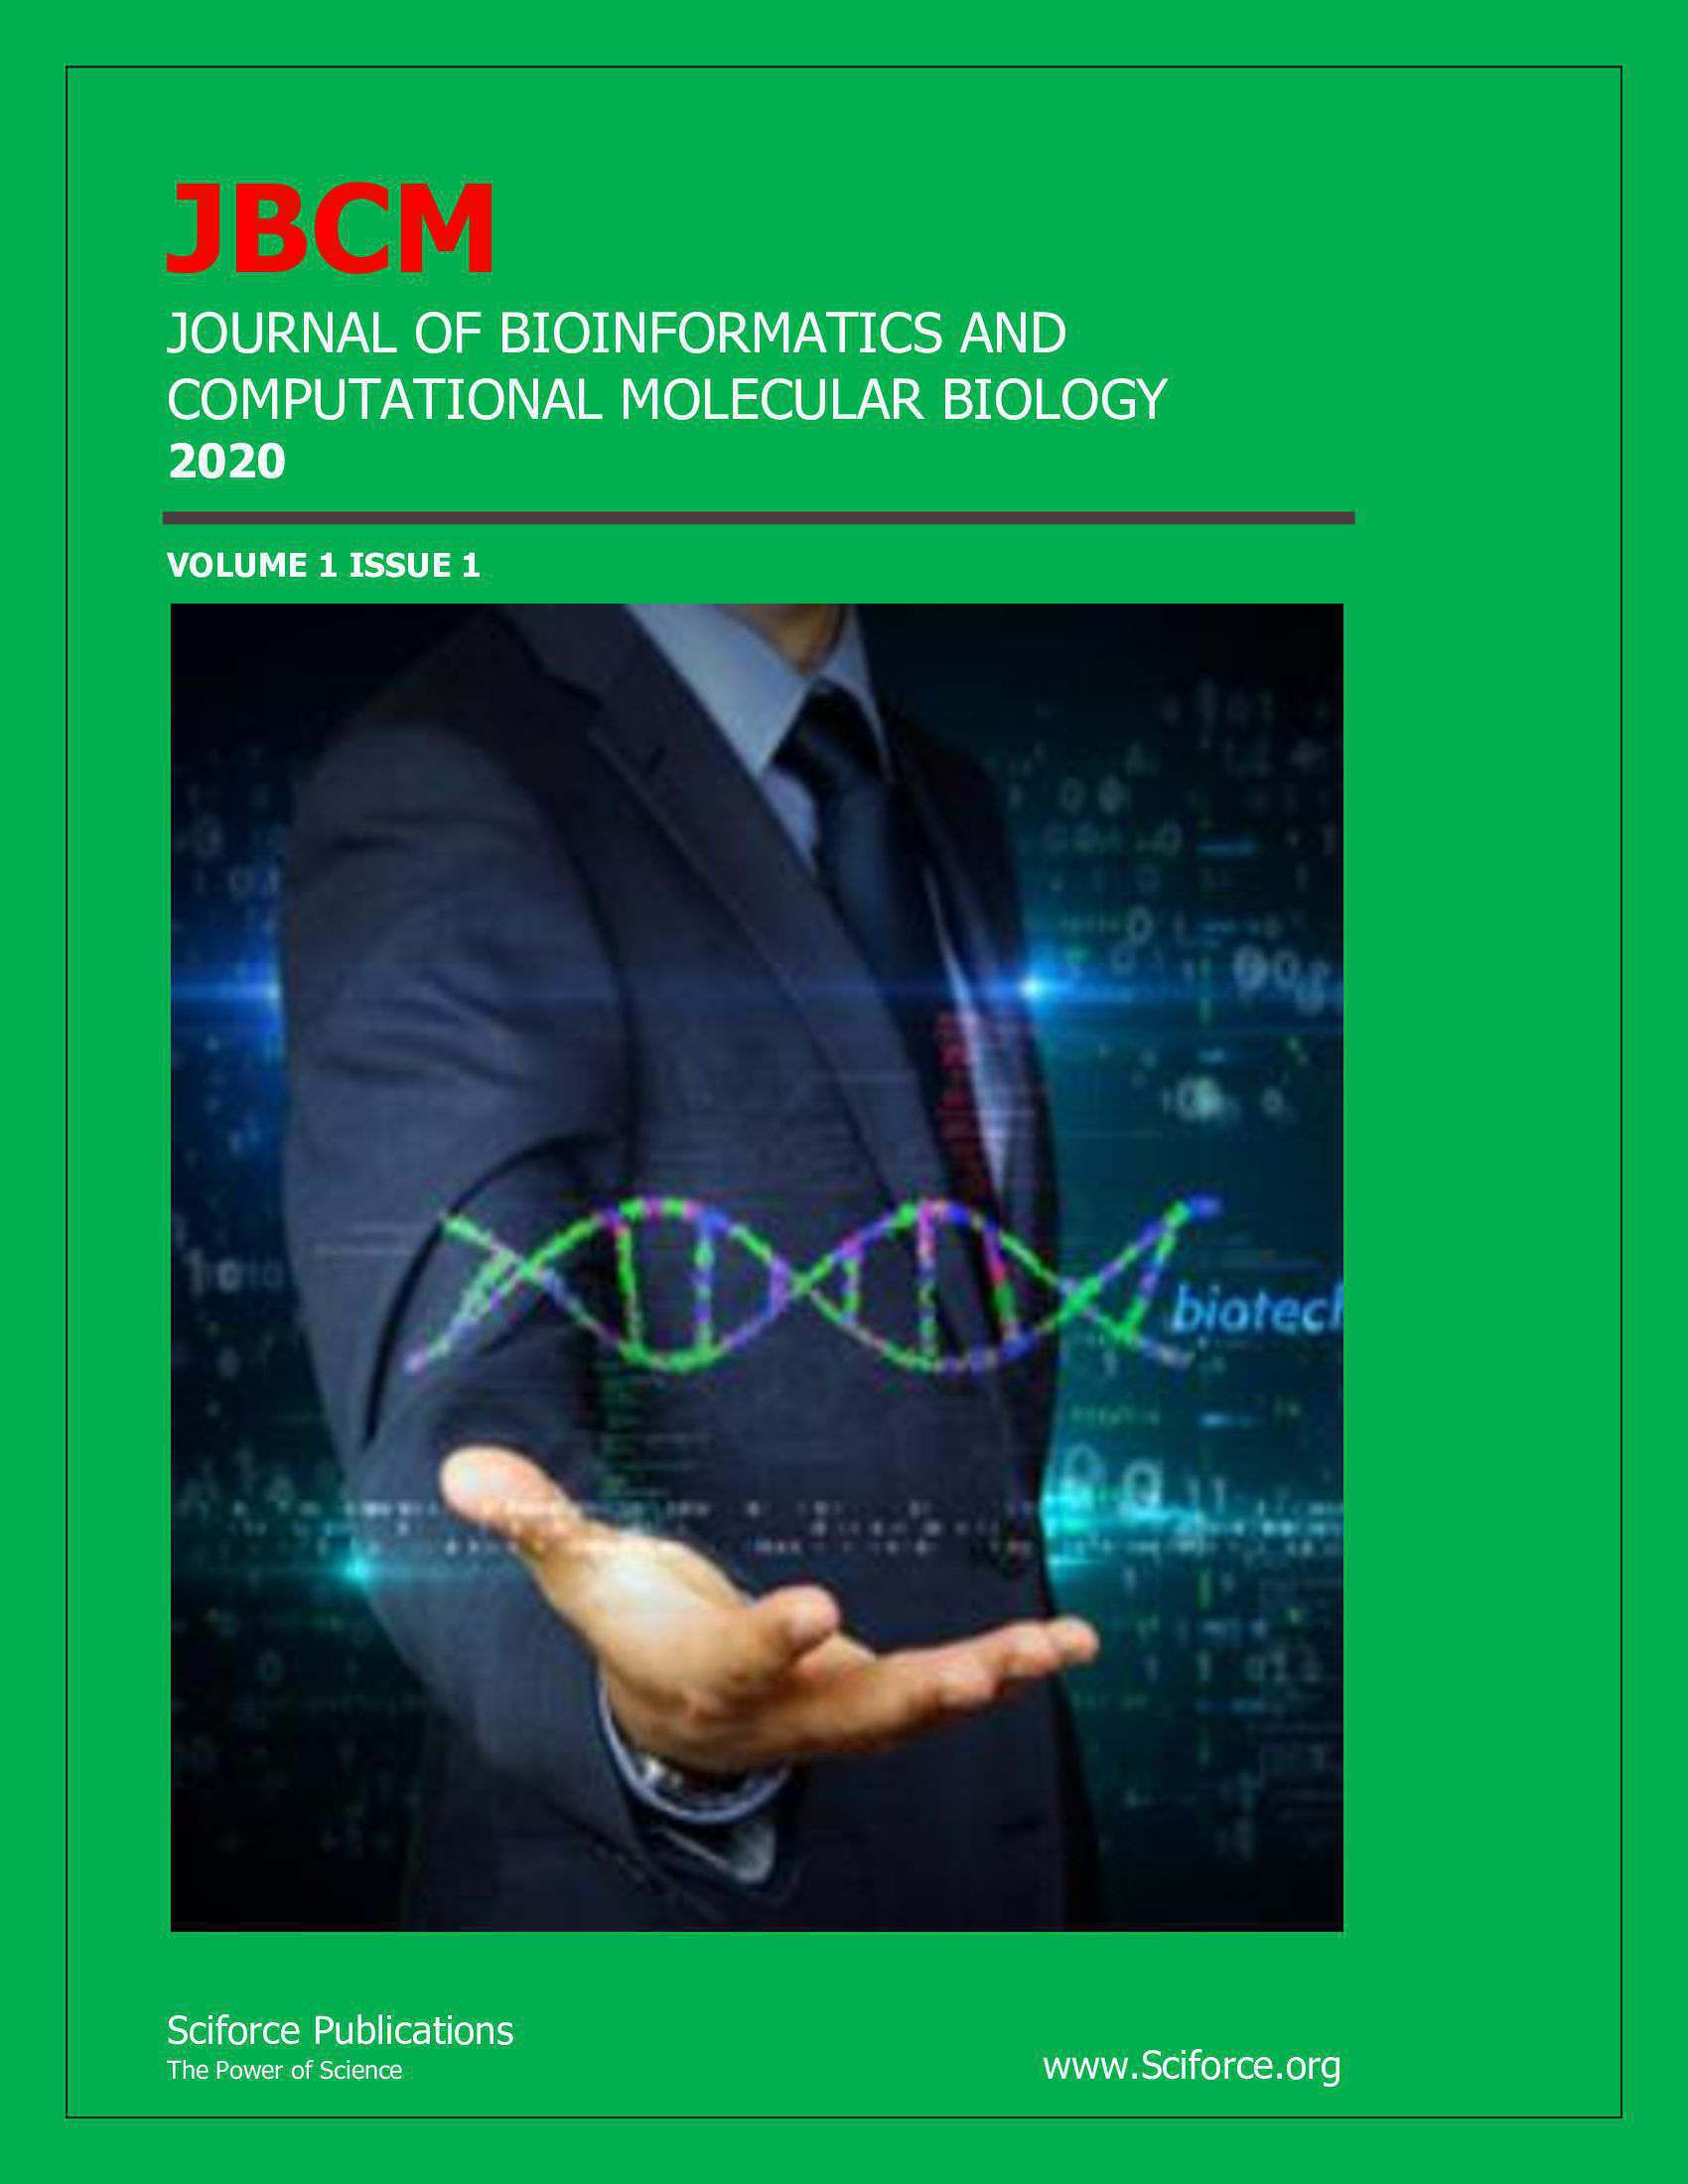 Journal of Bioinformatics and Computational Molecular Biology